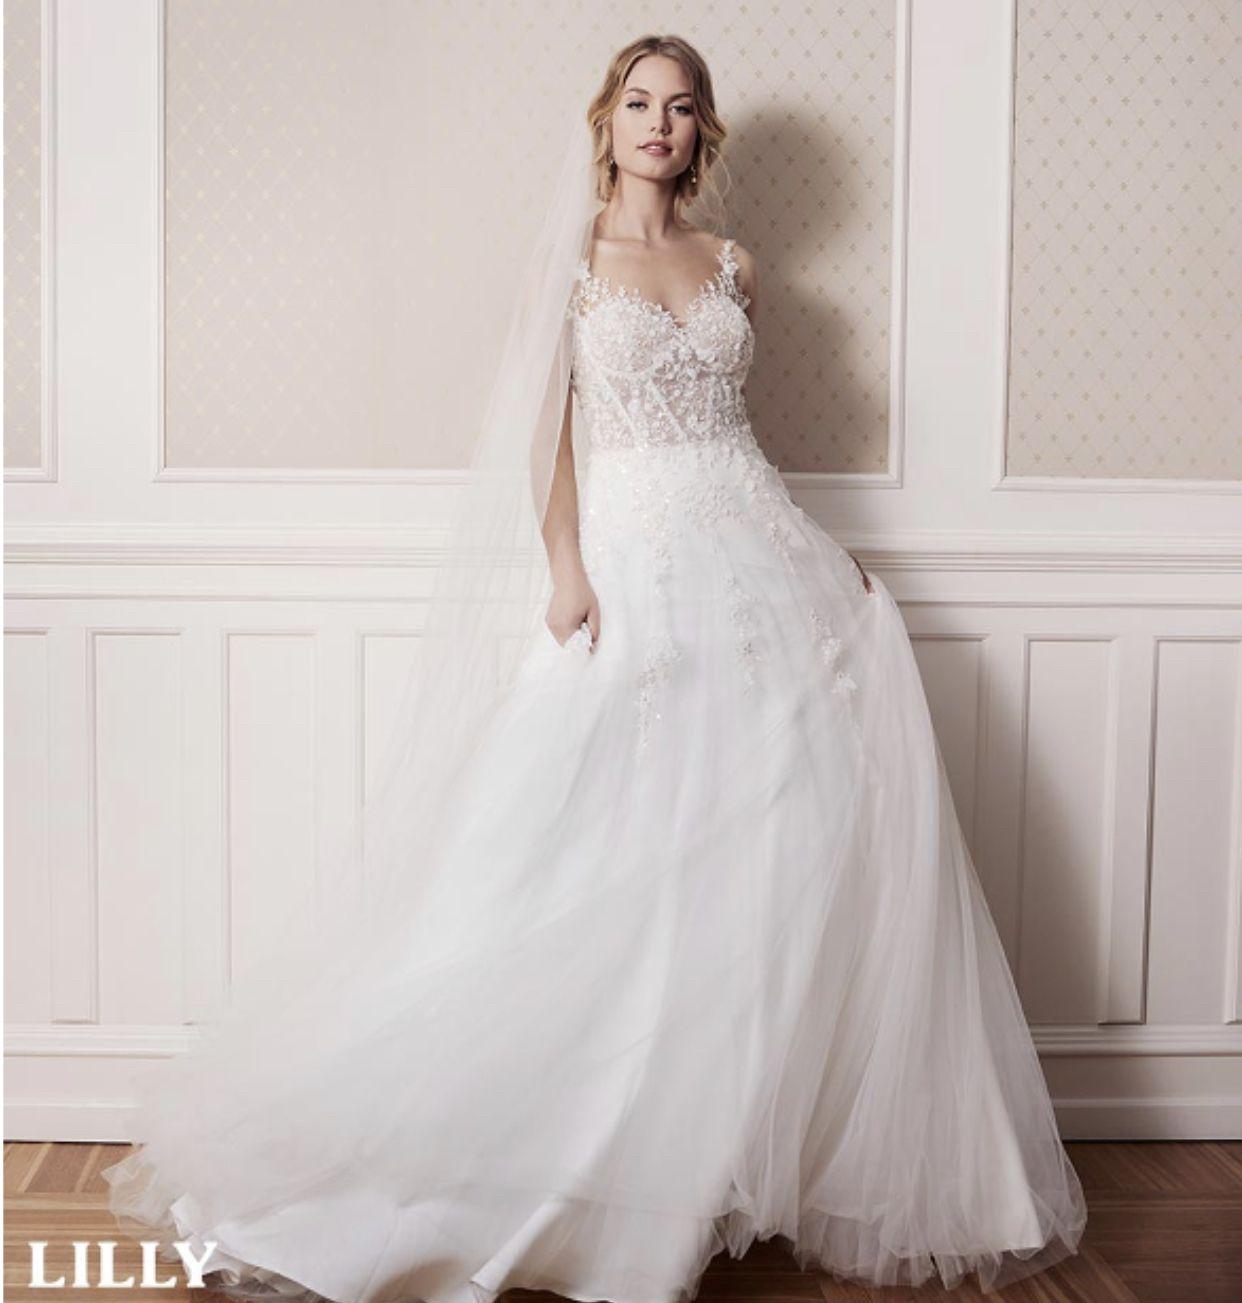 LILLY Brautkleid im Korsett-Stil  Bridal style, Wedding dresses